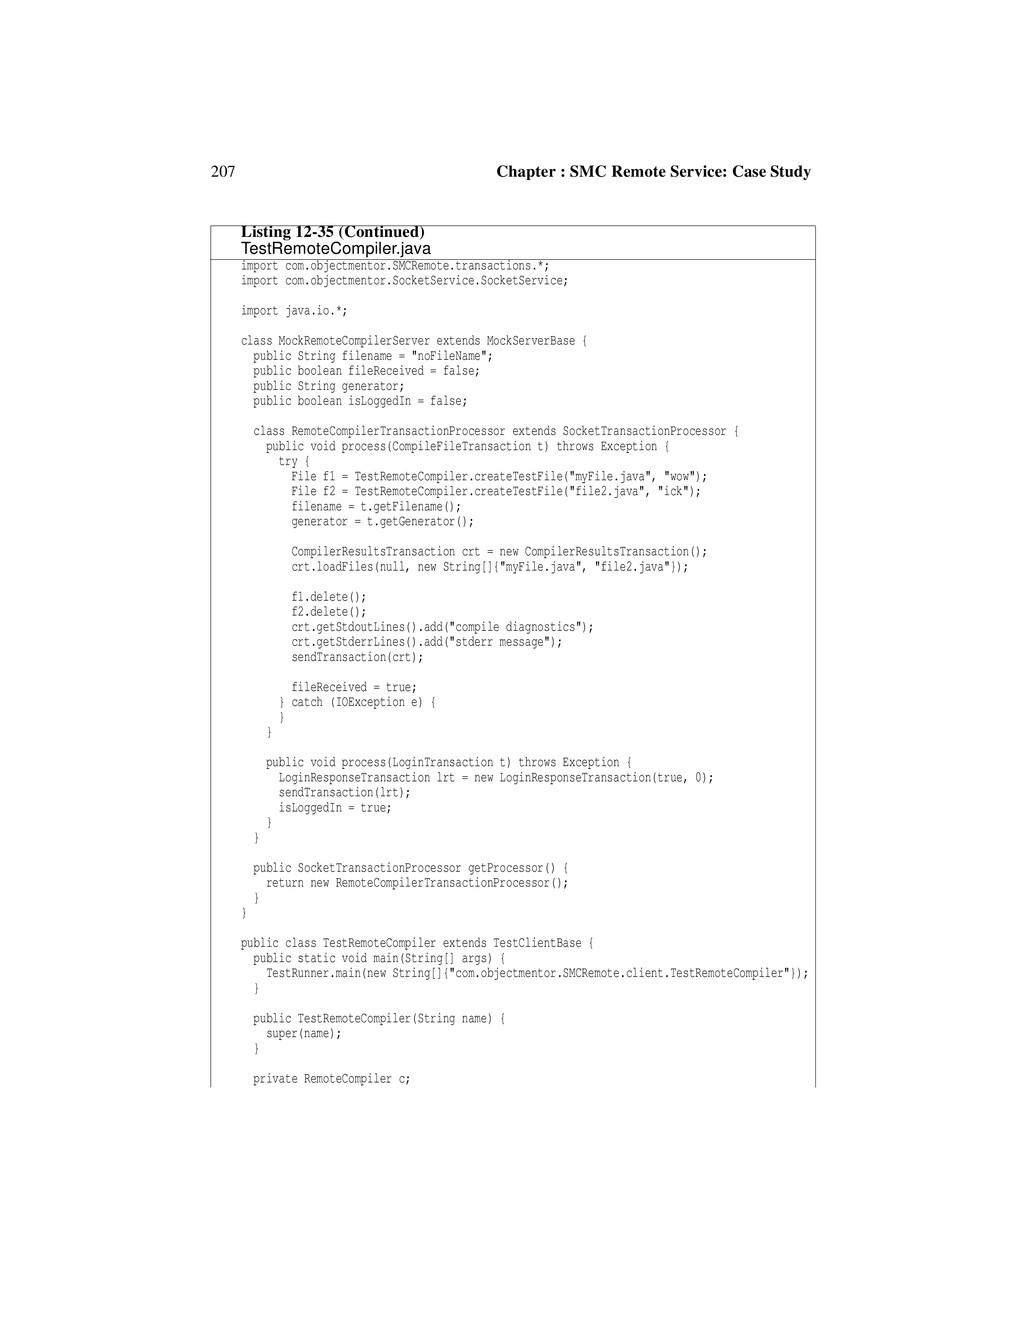 207 Chapter : SMC Remote Service: Case Study im...